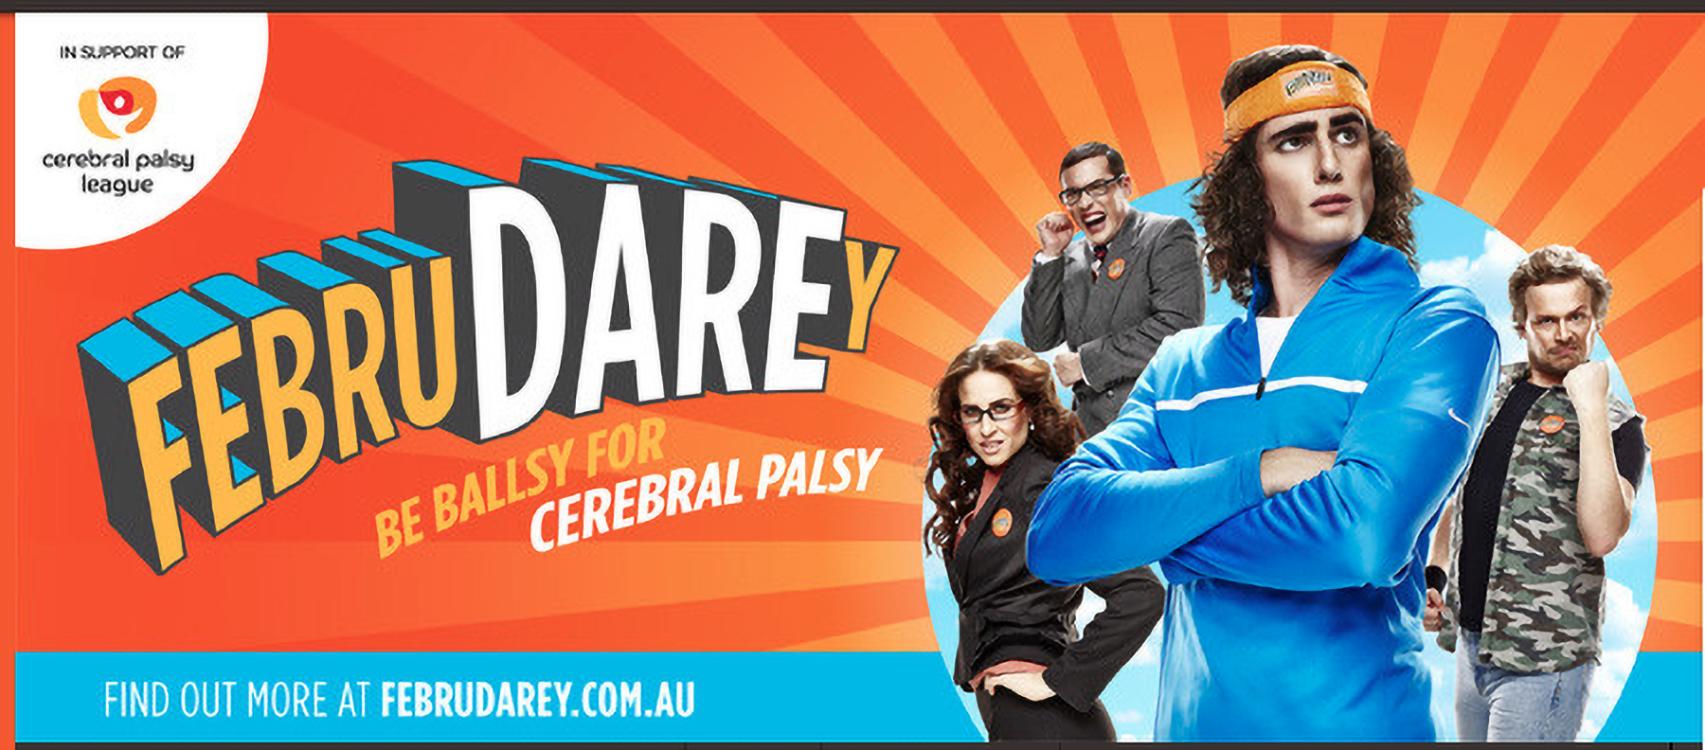 I'm Daring To Care This FebruDAREy for Cerebral Palsy League